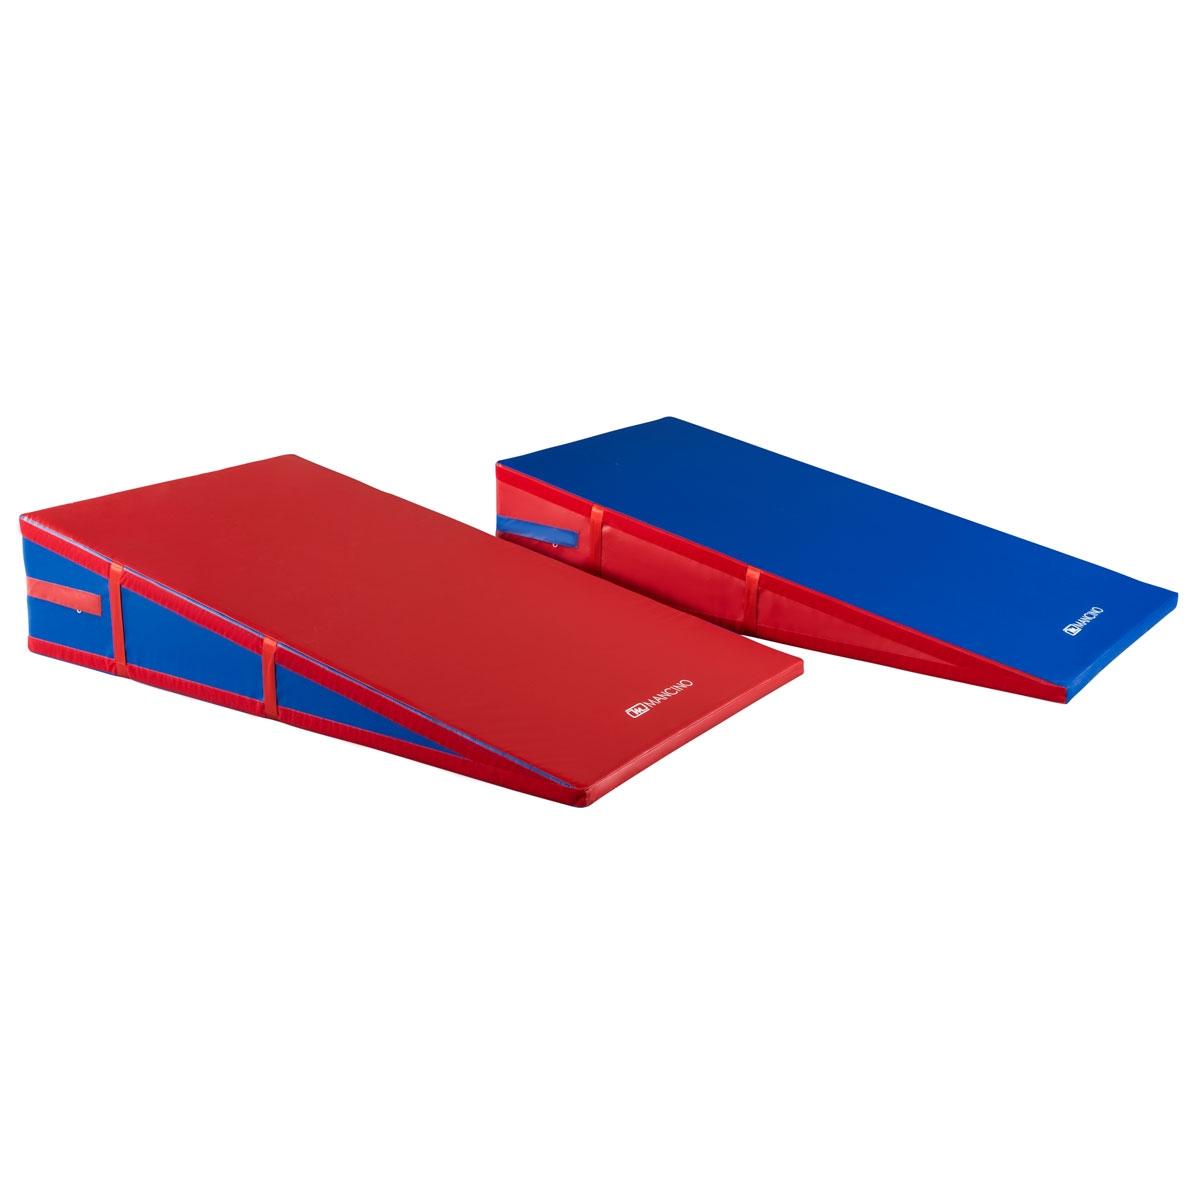 red blue incline cheese wedge mats   mancino mats